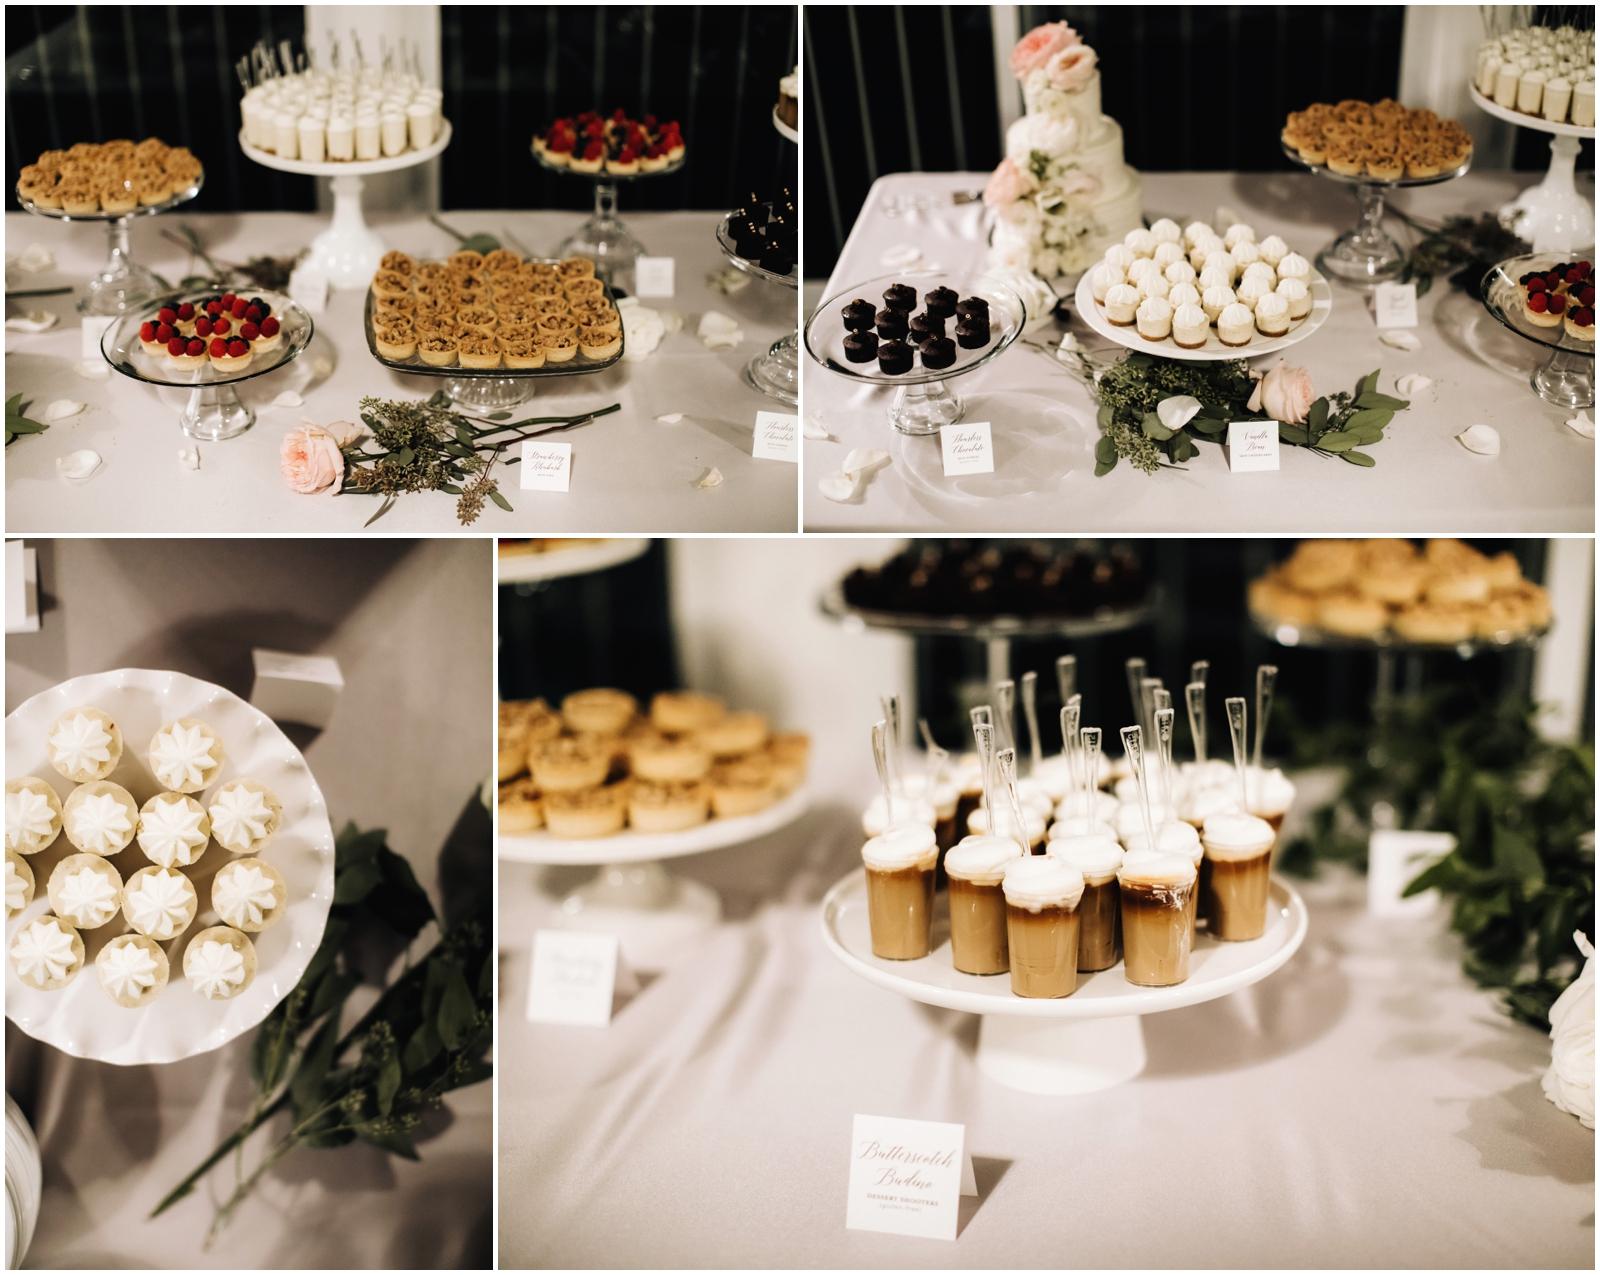 Minnesota Wedding Planner. Lafayette Club Wedding. Wedding Reception Inspiration. Wedding Decor. Greenery Wedding. Dessert Display Table